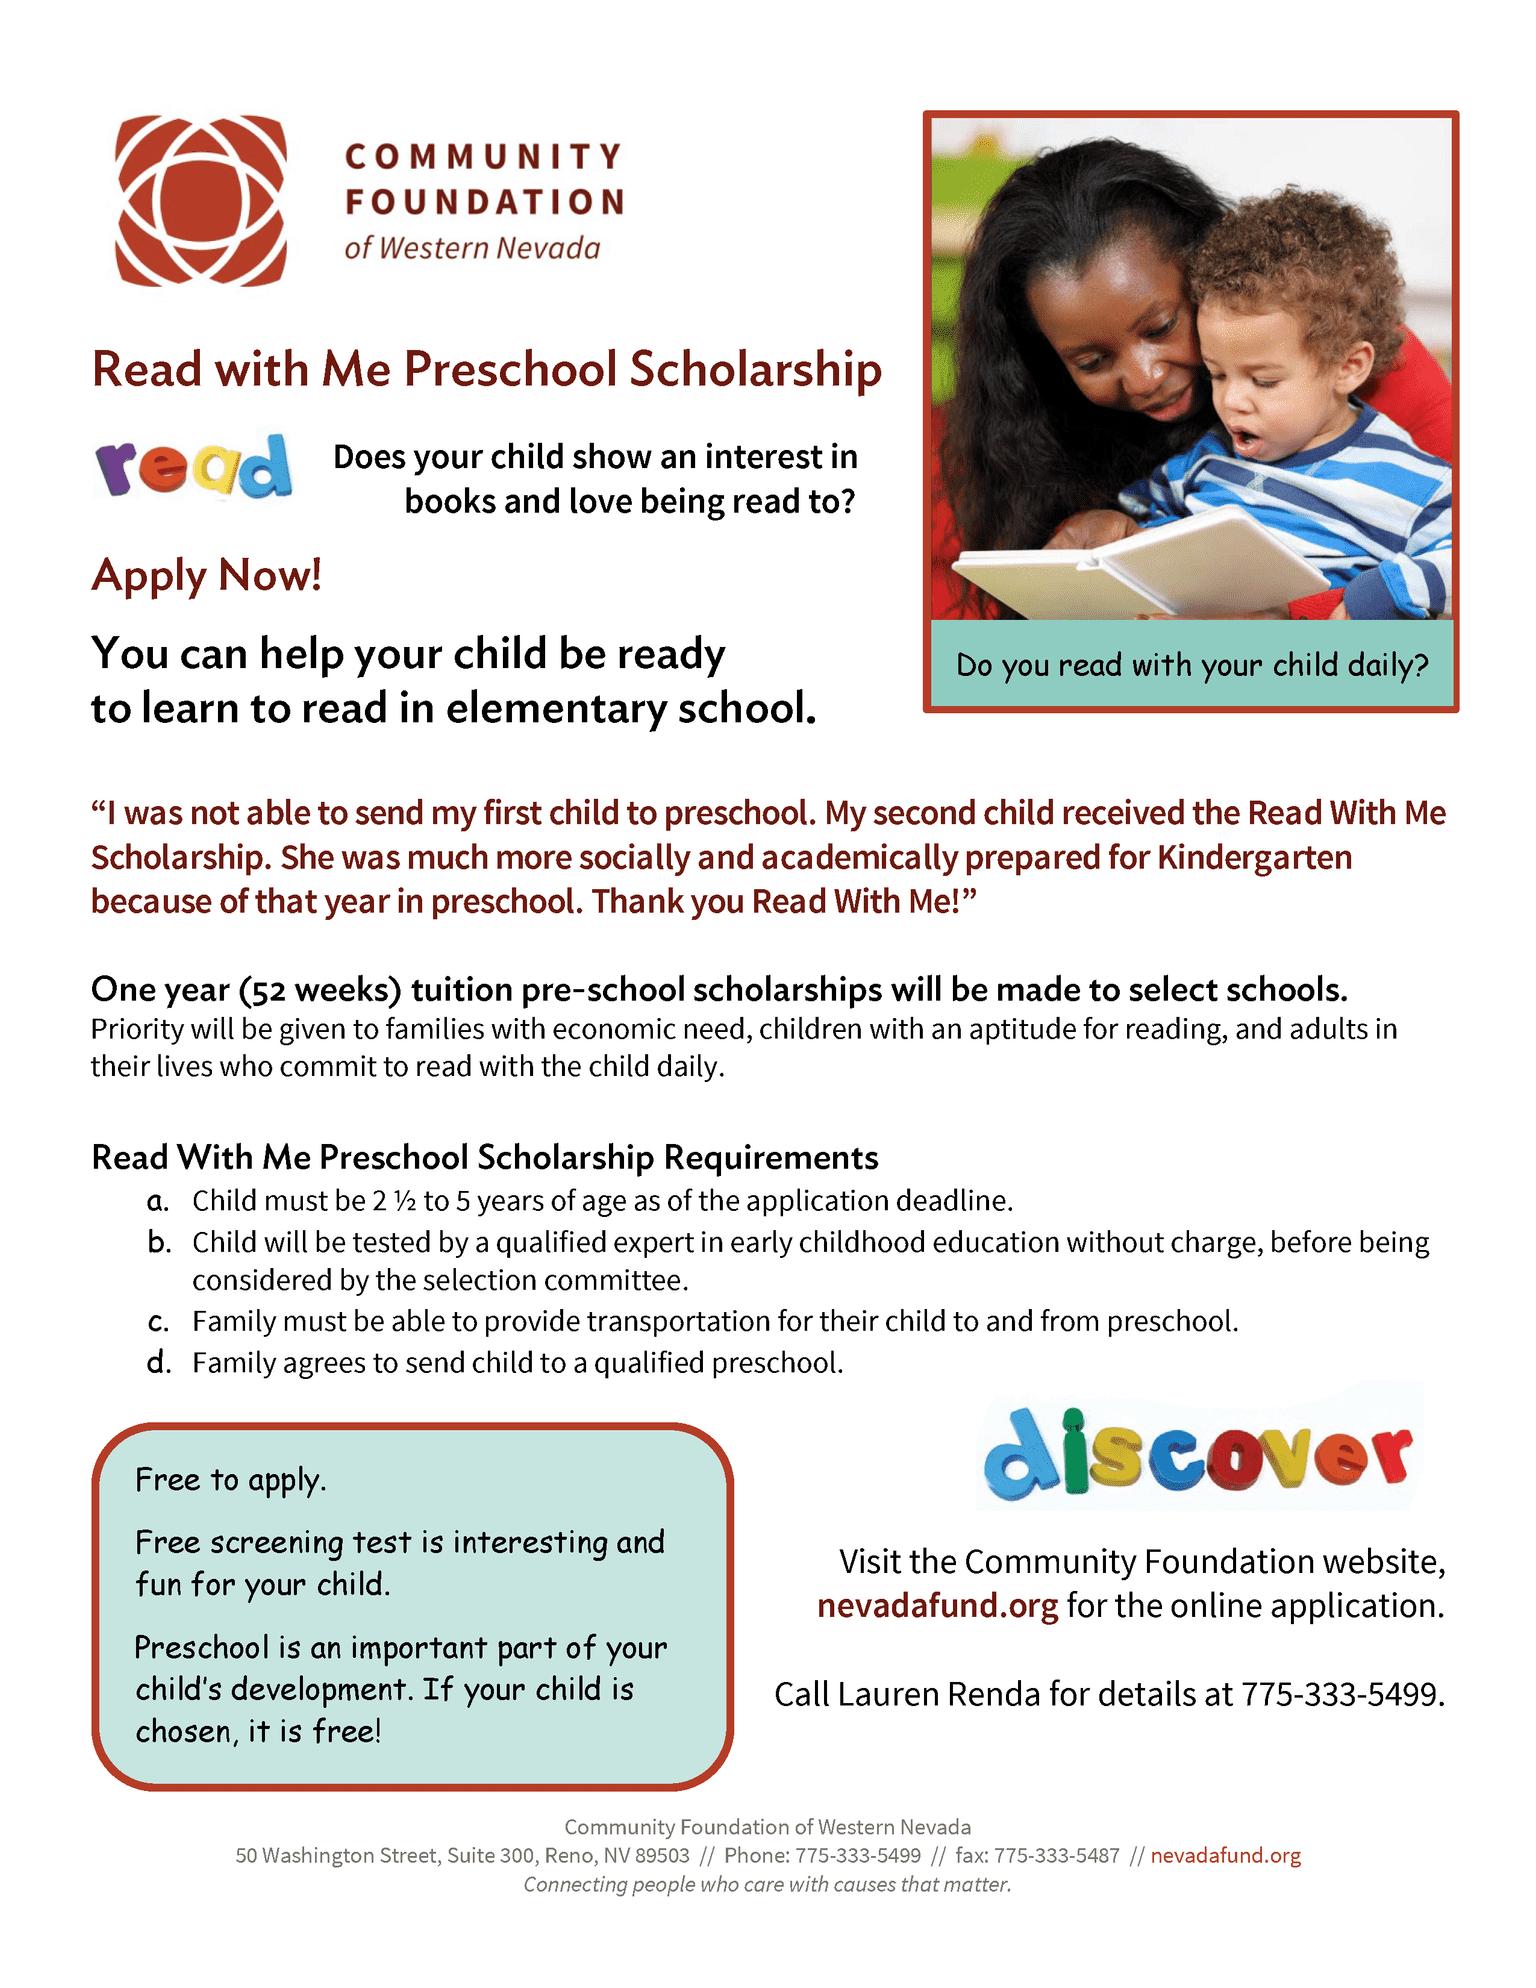 Read with Me Preschool Scholarship flyer